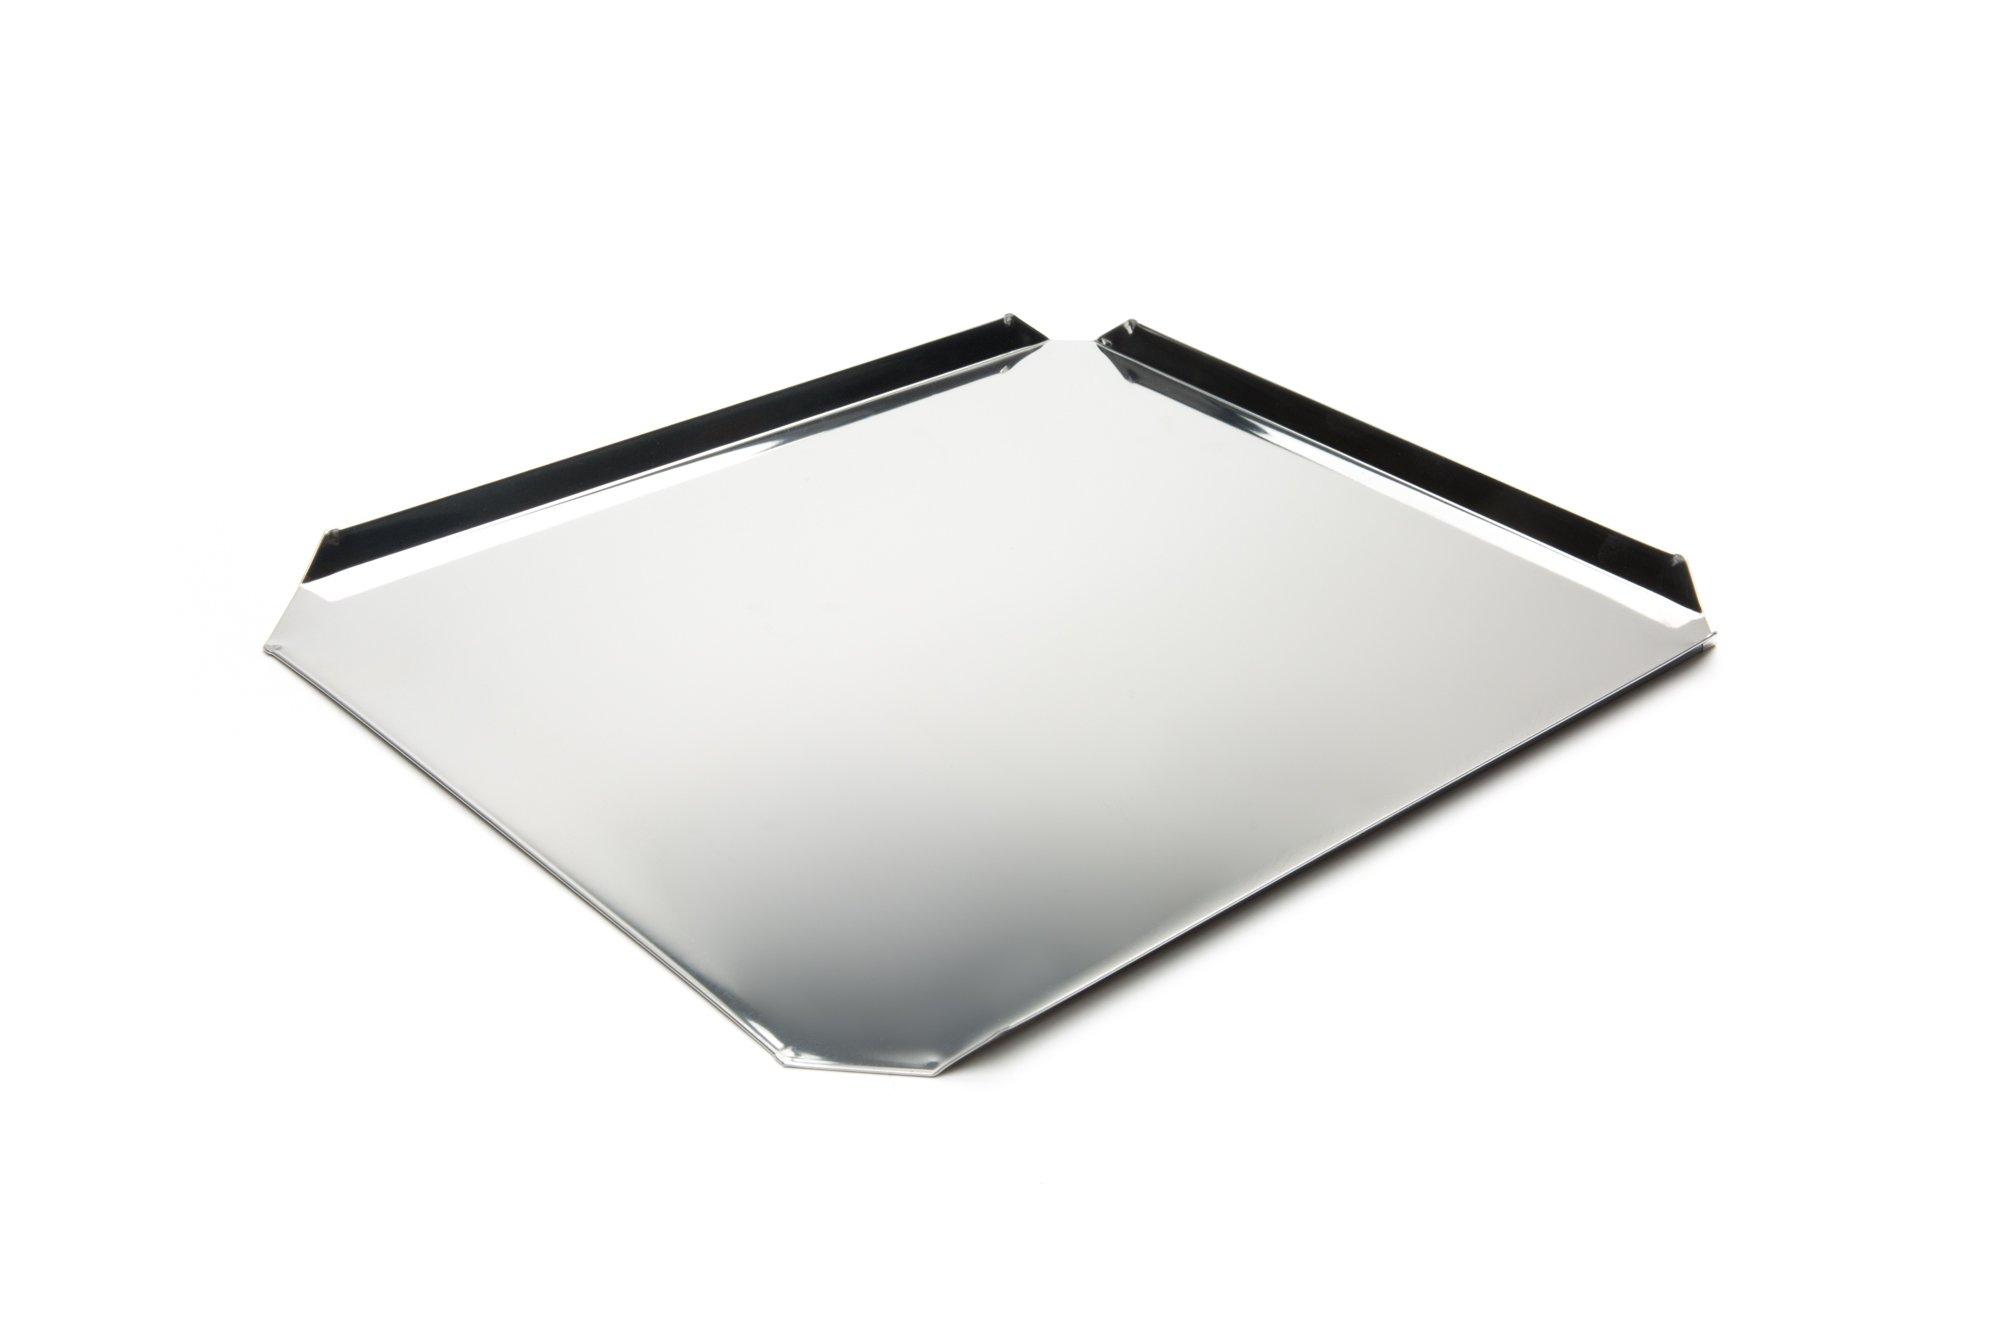 Fox Run 4852 Cookie Sheet, Stainless Steel, 12-Inch x 14-Inch